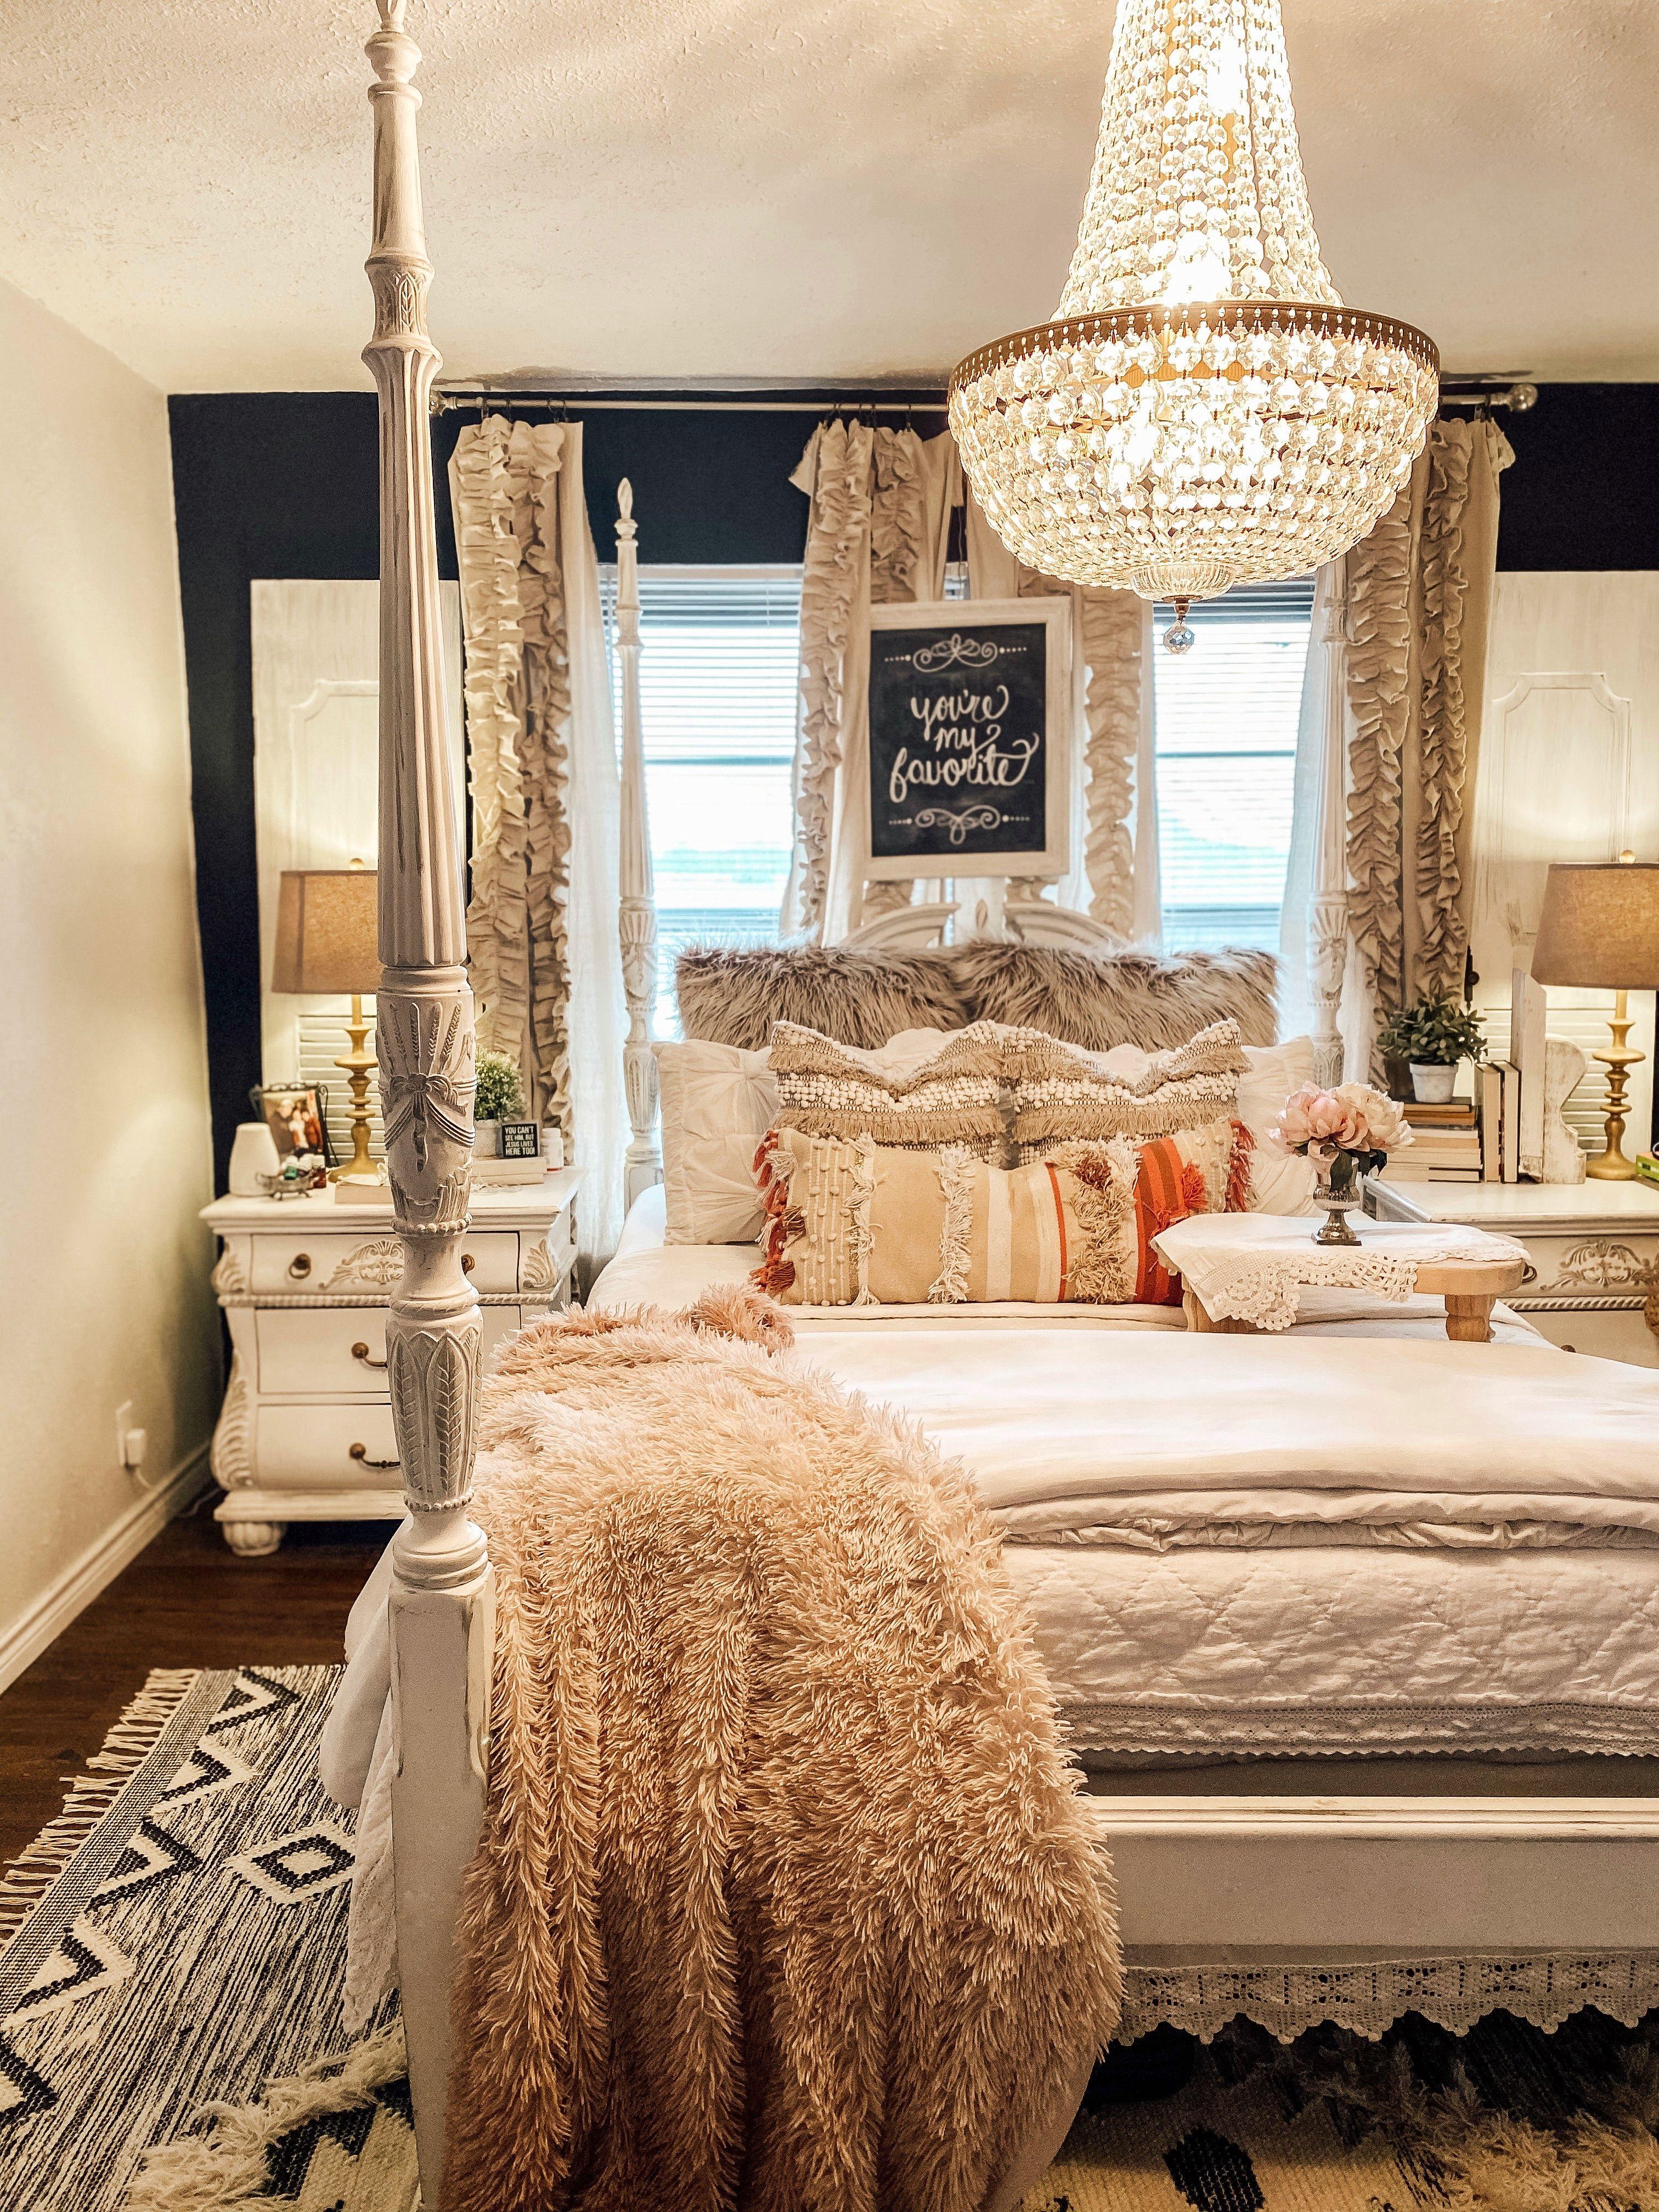 Boho farmhouse bedroom, glam bedroom, cottage bedroom